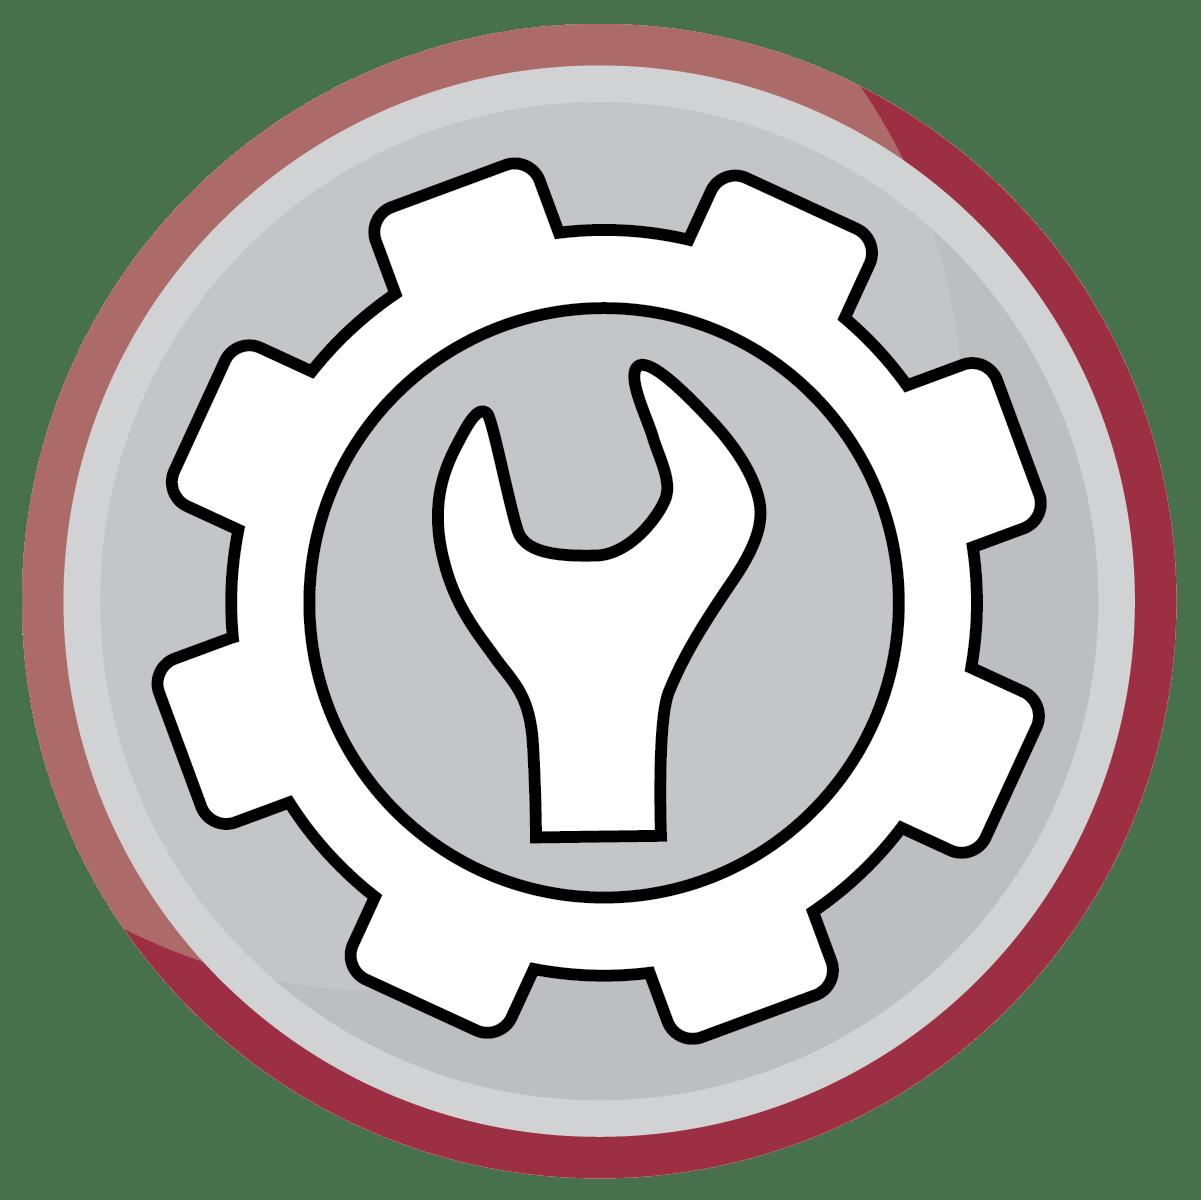 Journeyman heavy duty mechanics. Mechanic clipart maintenance supervisor